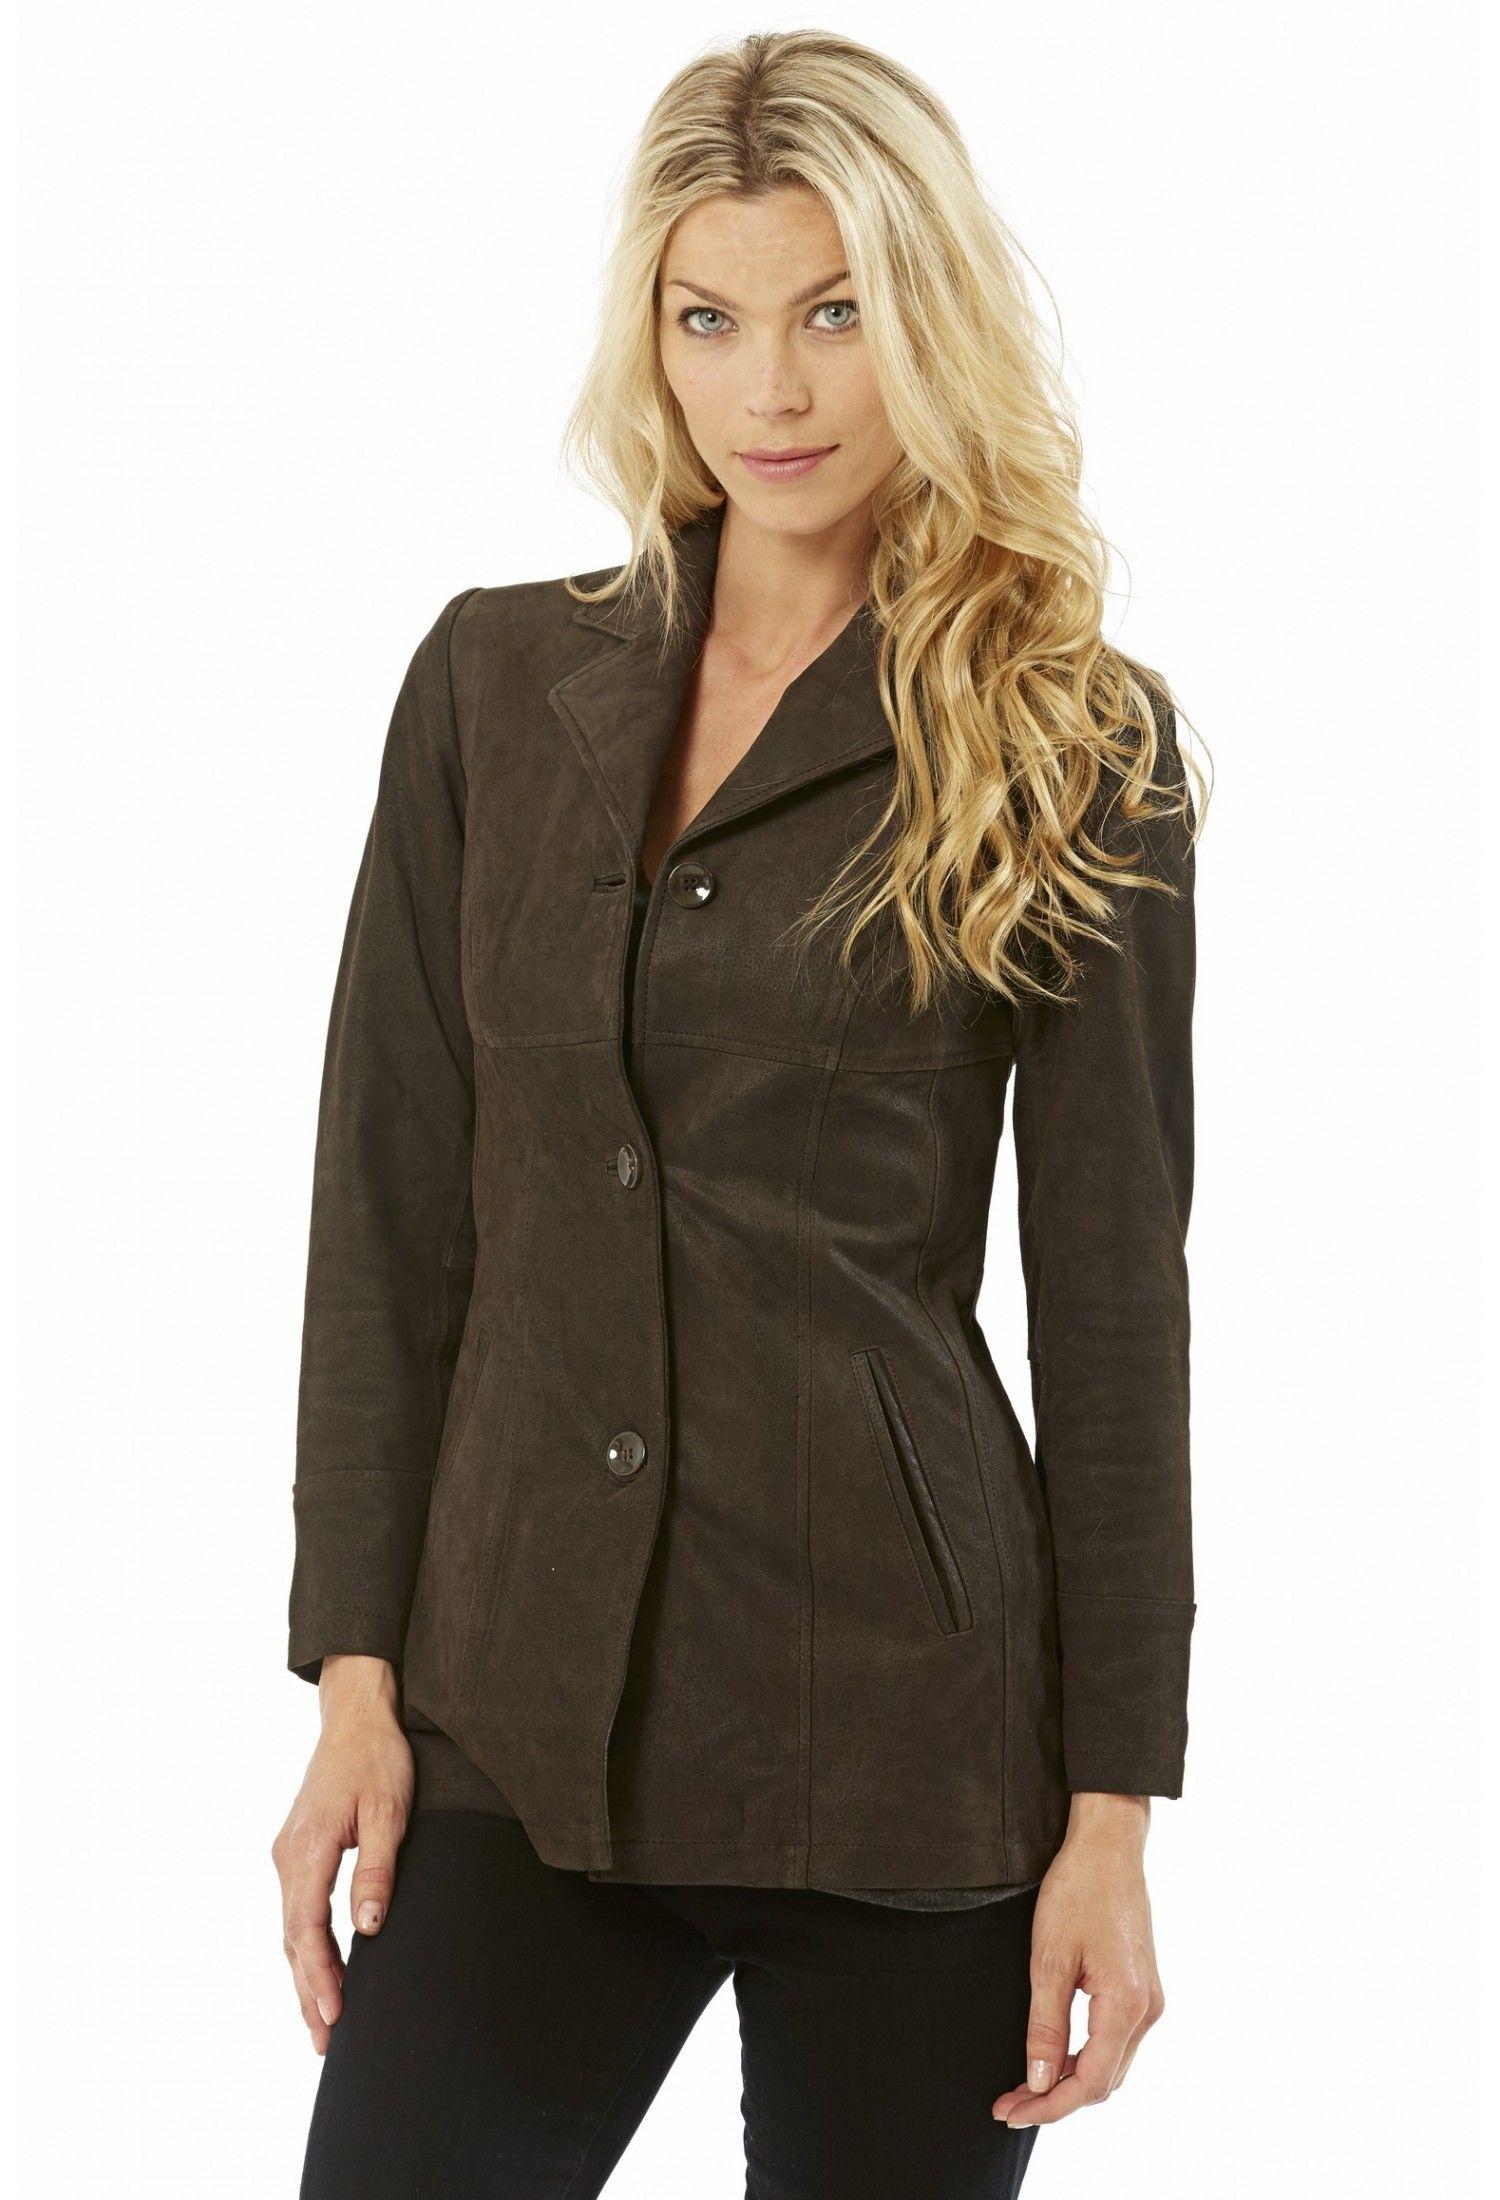 Veste en cuir femme oversize